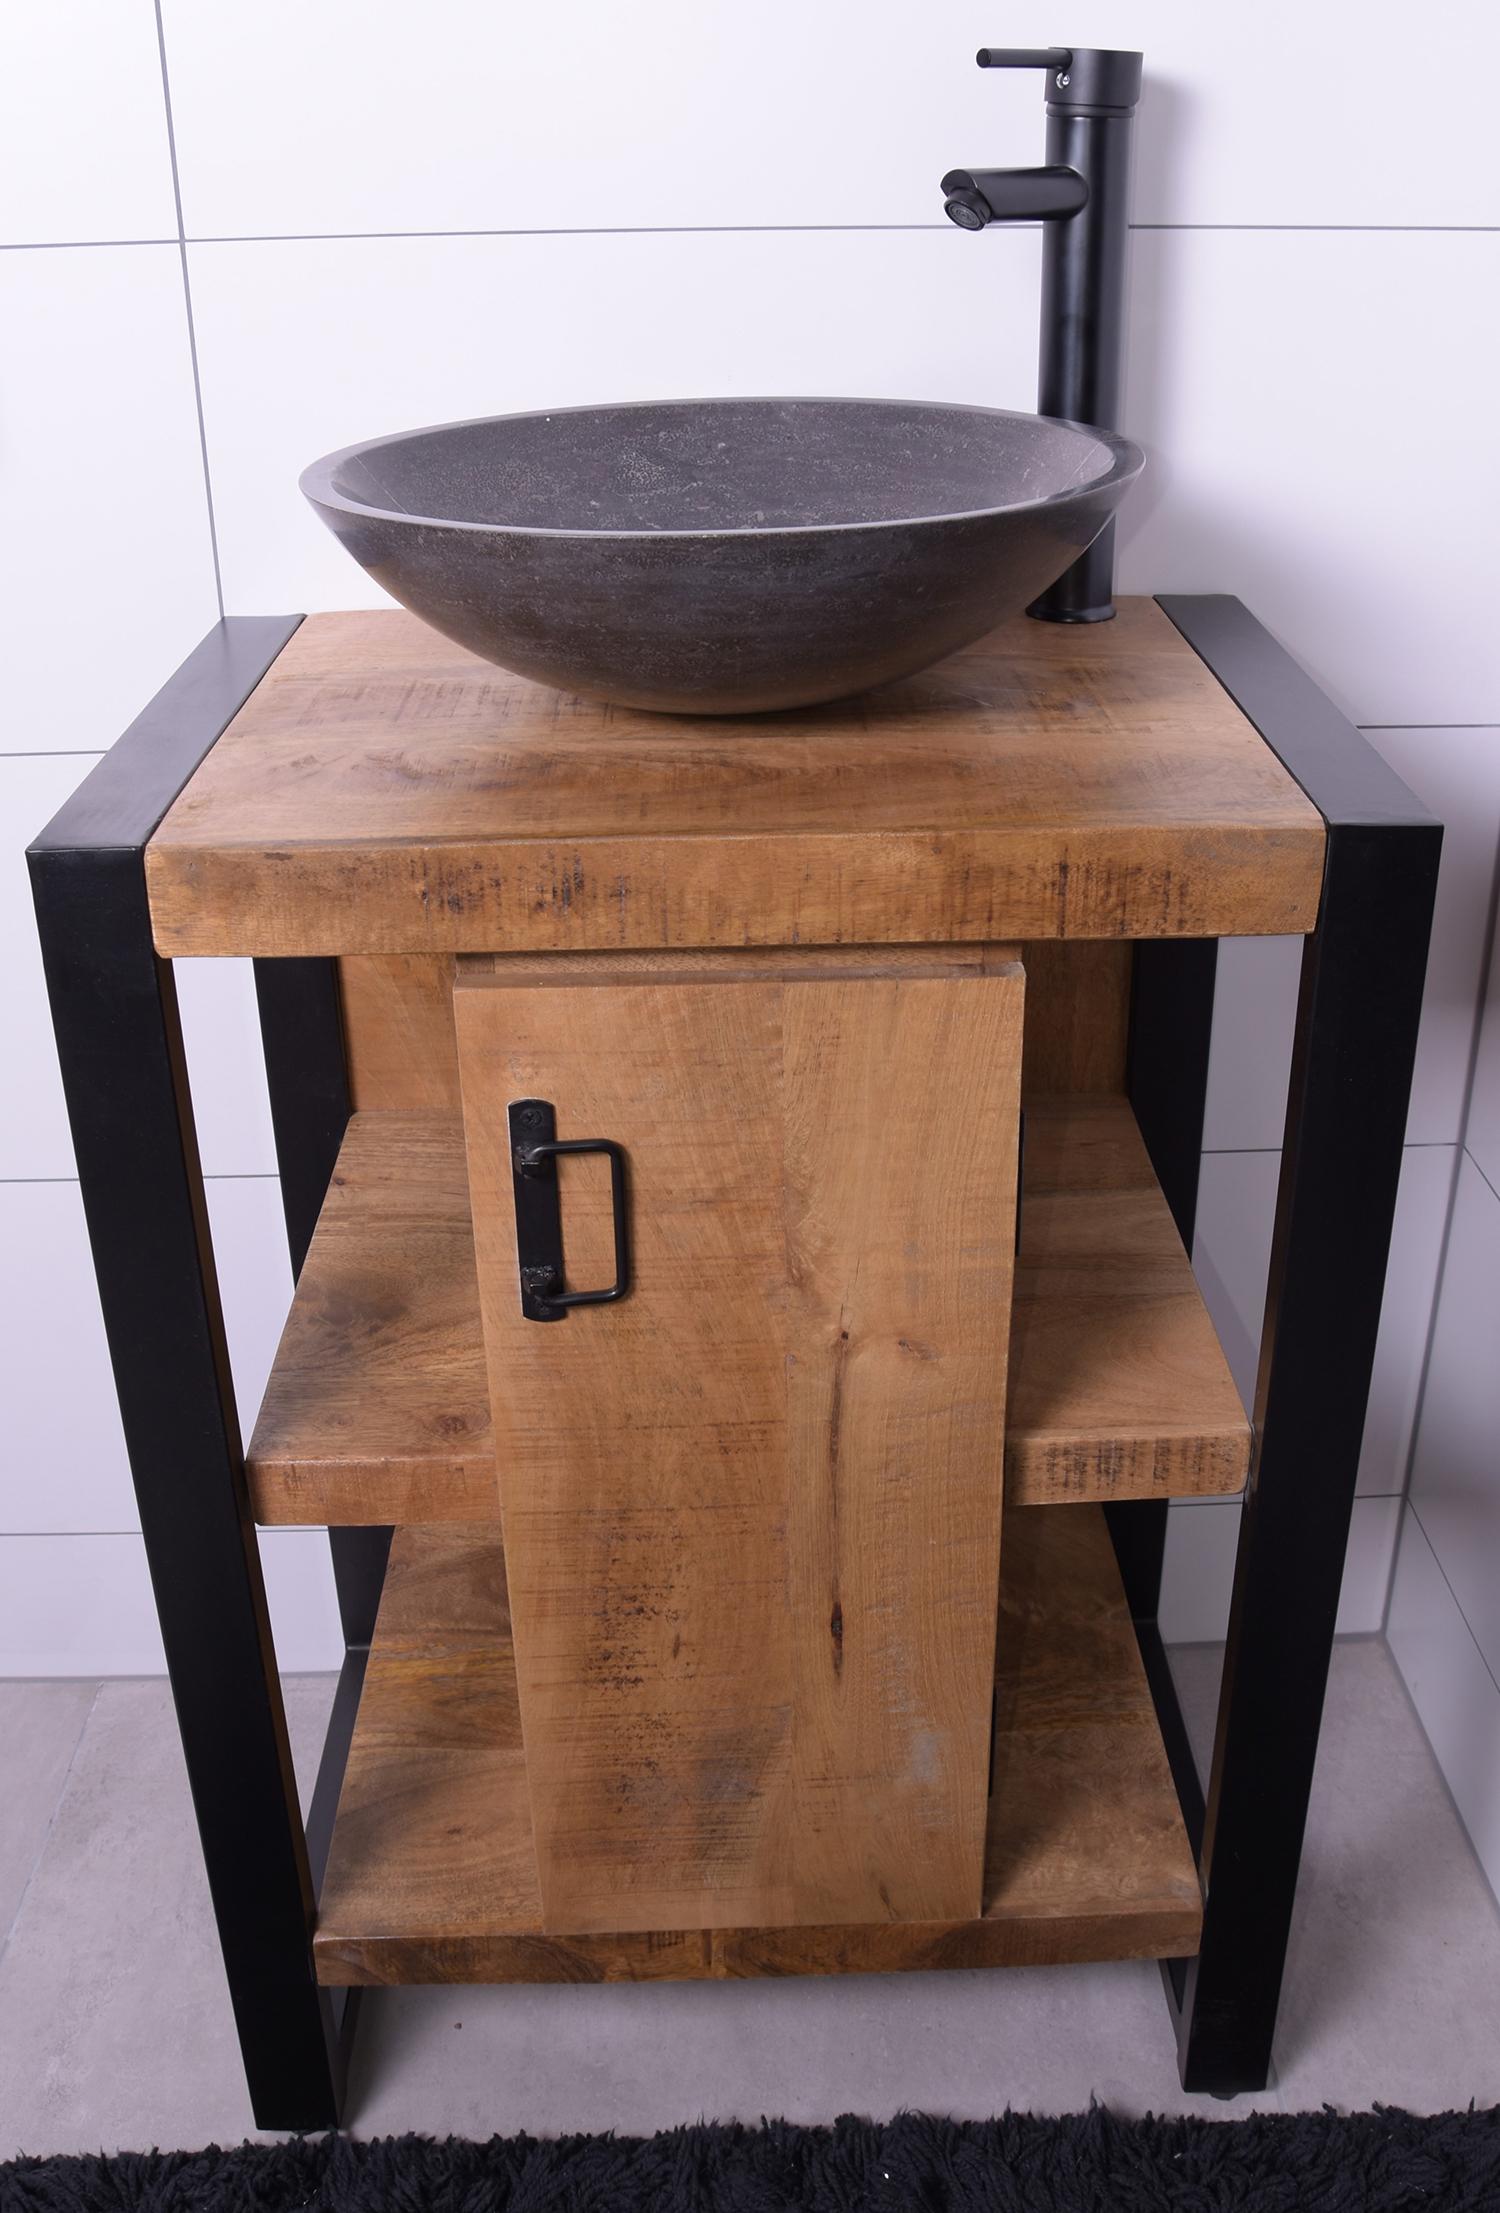 MD Interior Mocu mangohout wastafelmeubel 60cm met natuursteen kom